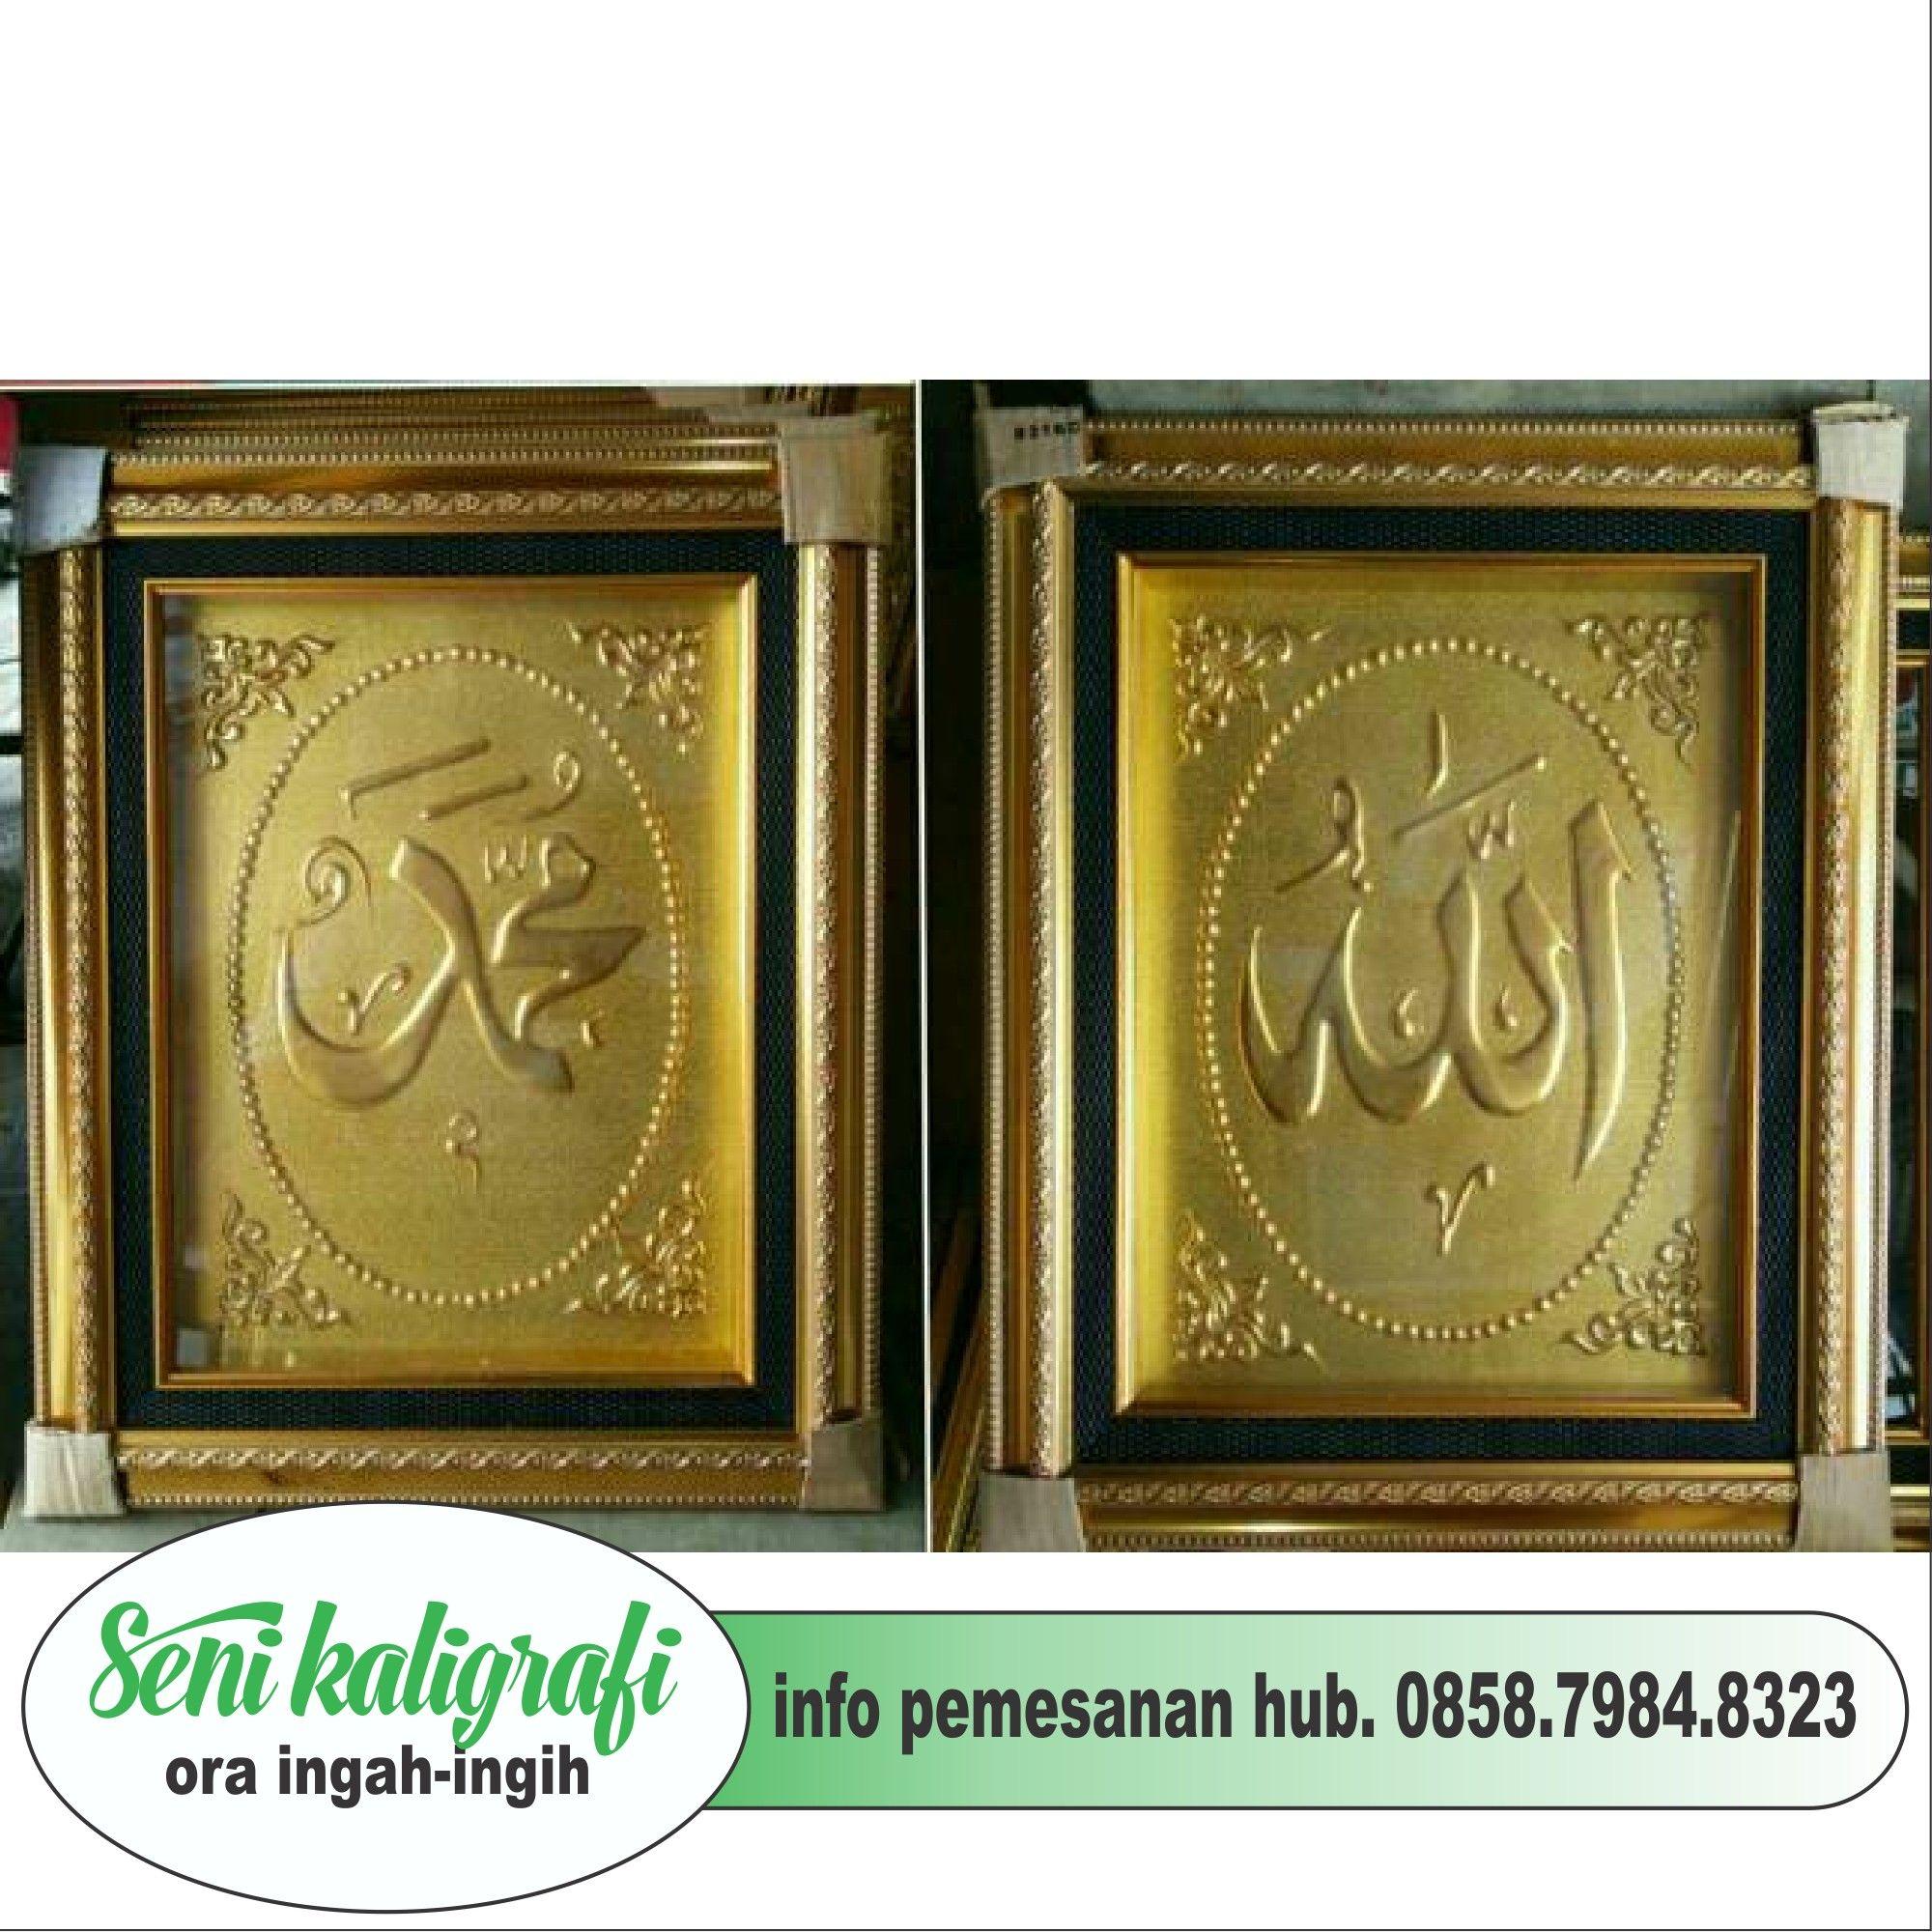 kaligrafi timbul Banjarnegara,kaligrafi timbul prada emas